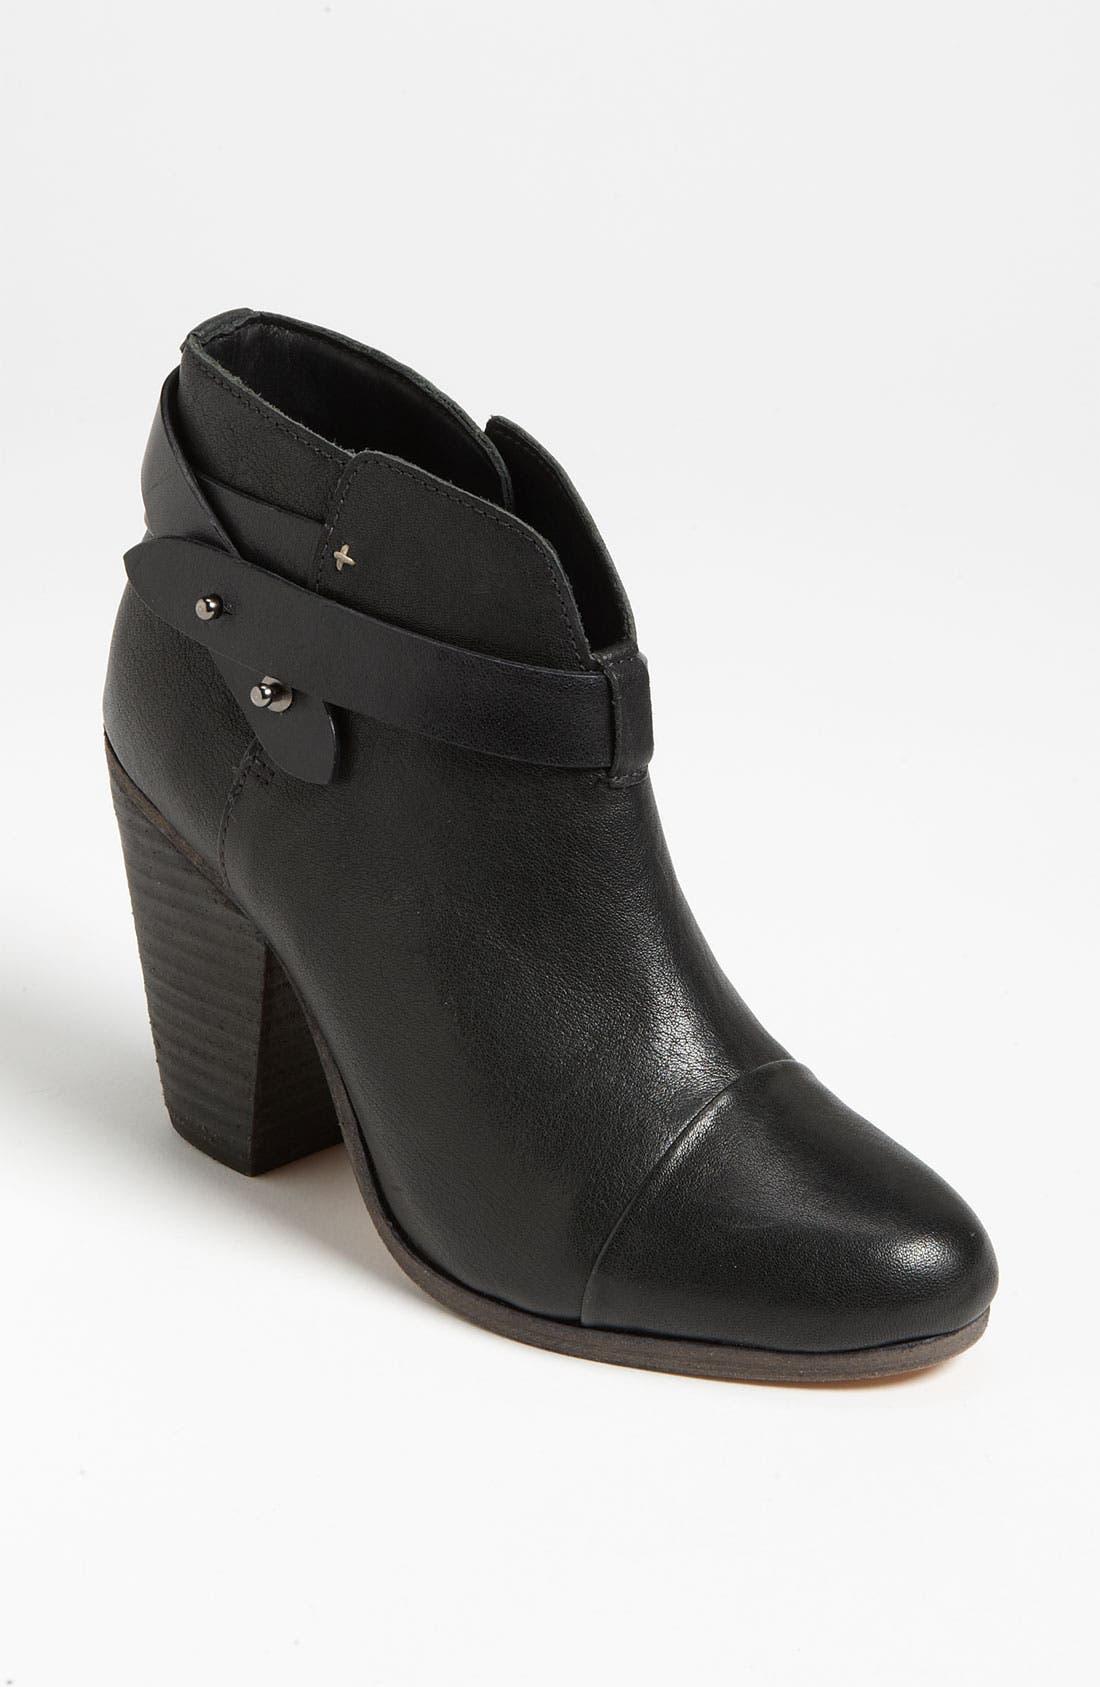 Main Image - rag & bone 'Harrow' Boot